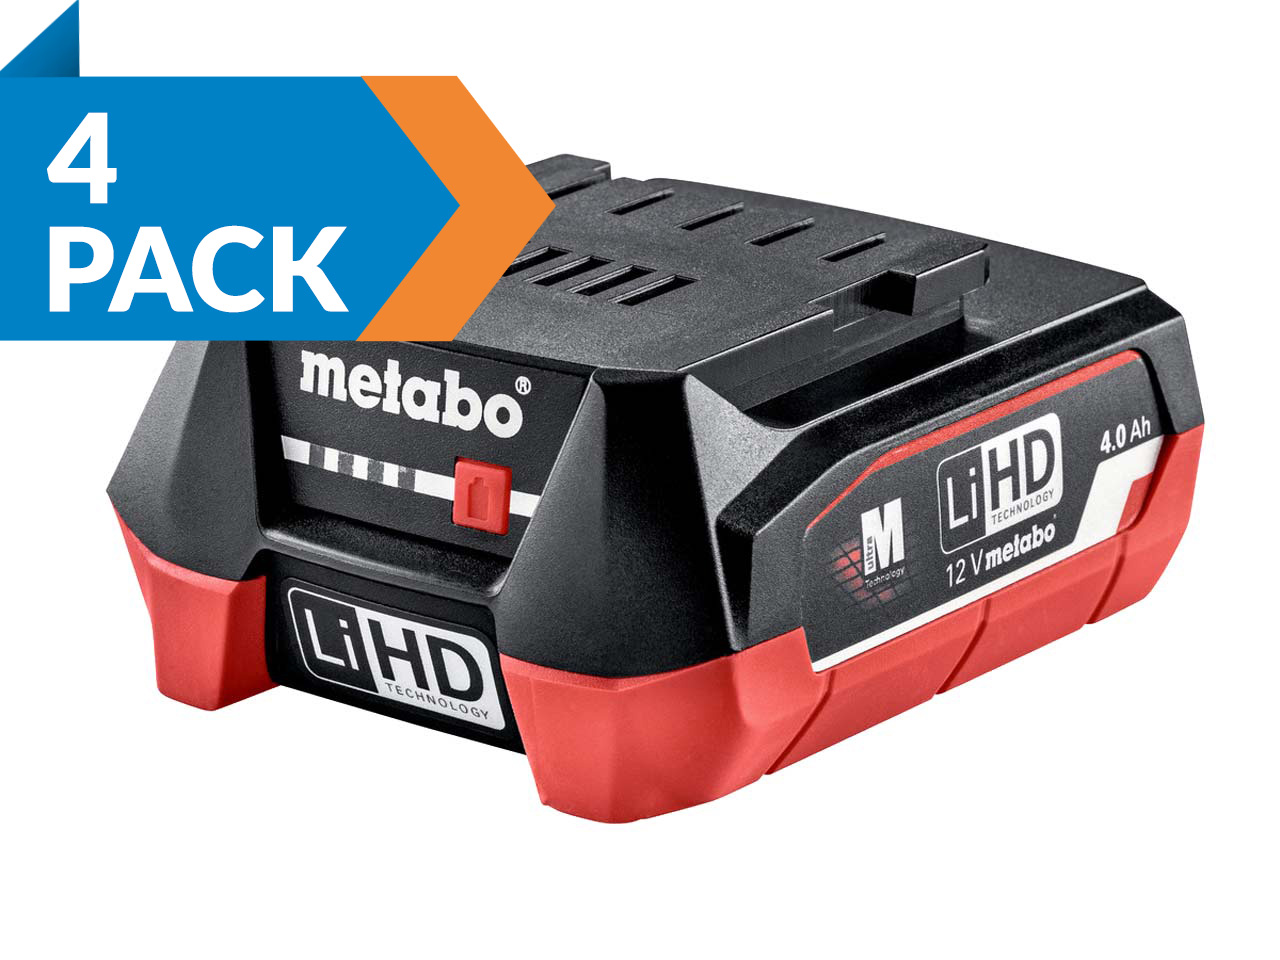 Metabo_6253490004pk.jpg